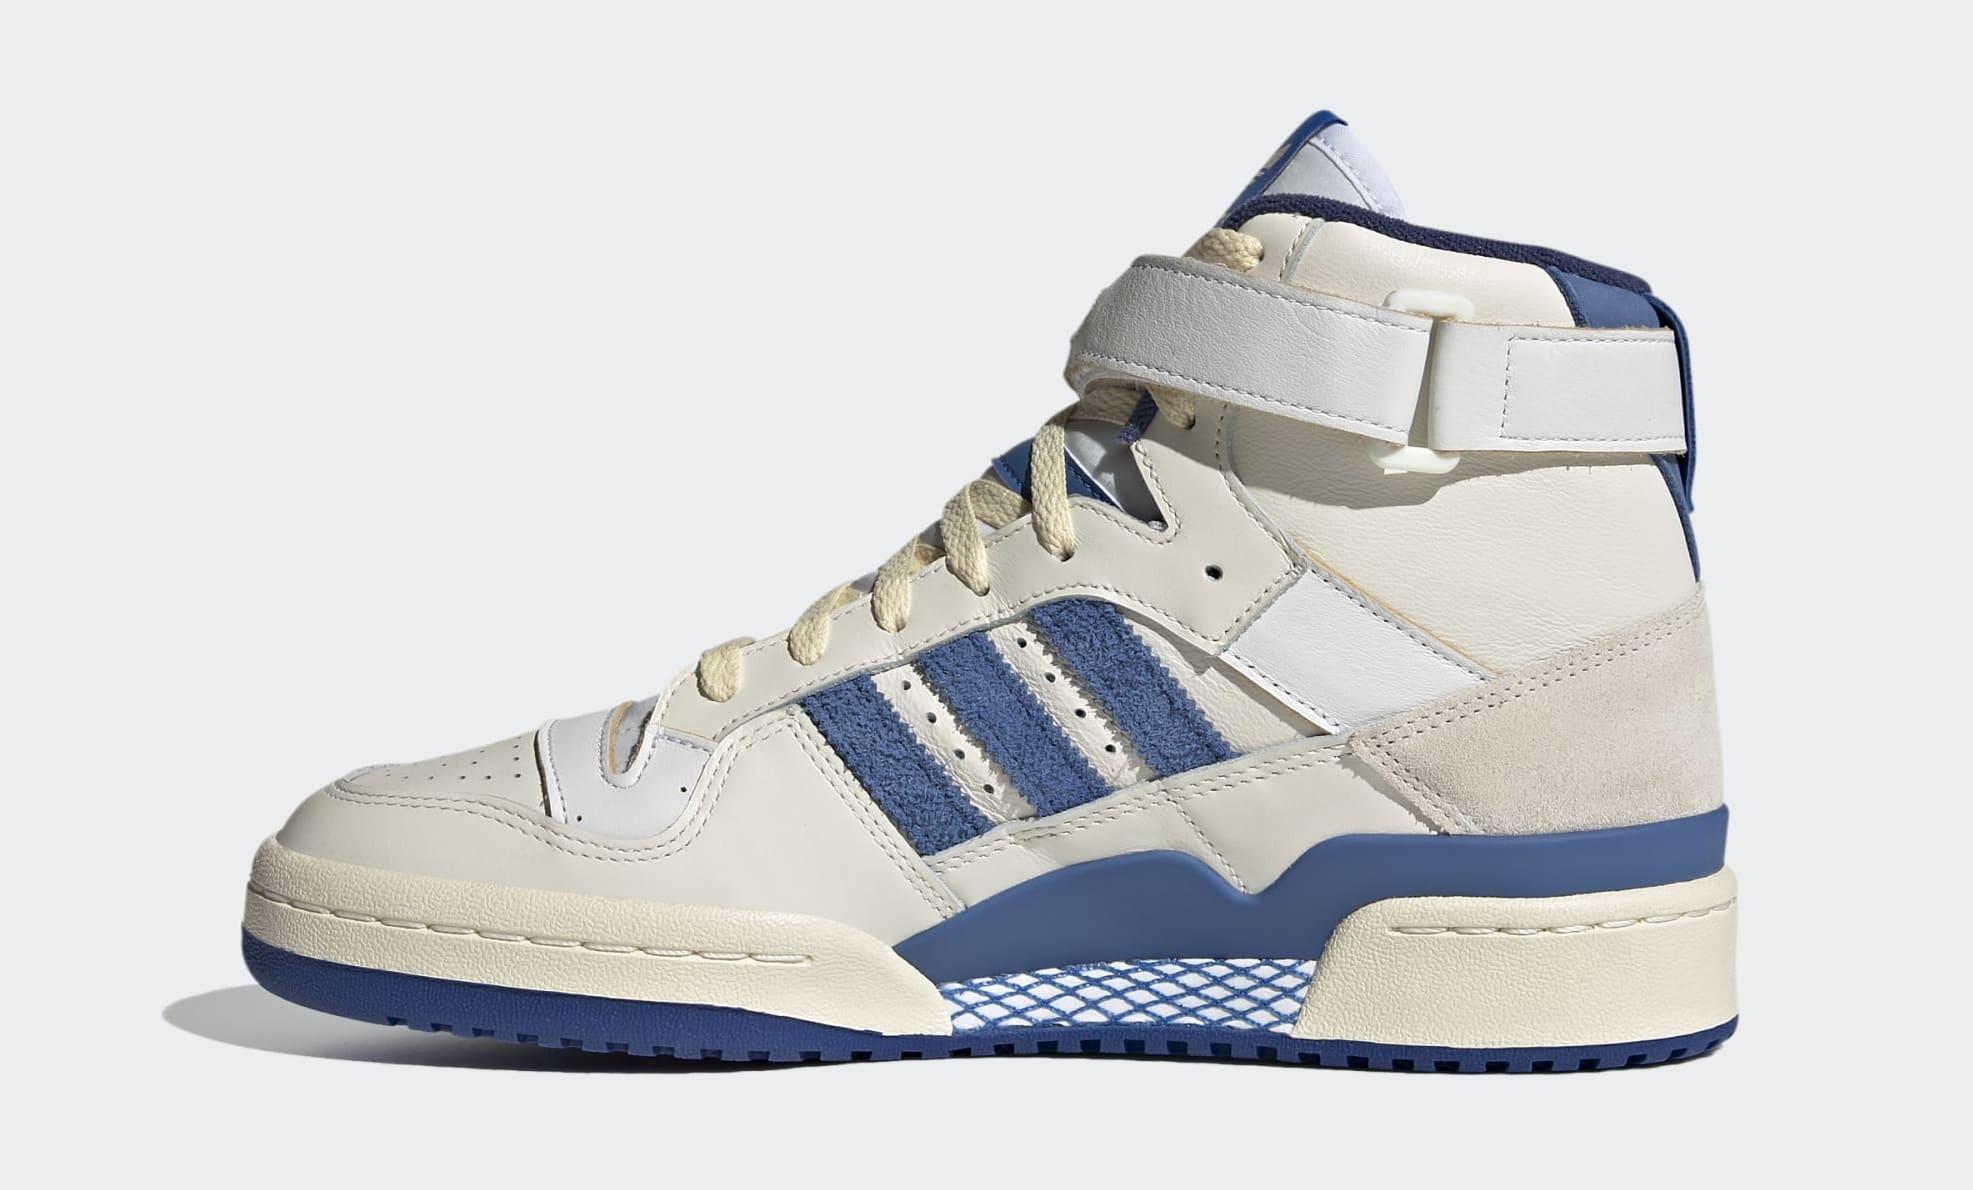 Adidas OG Forum 84 FY7793 Medial